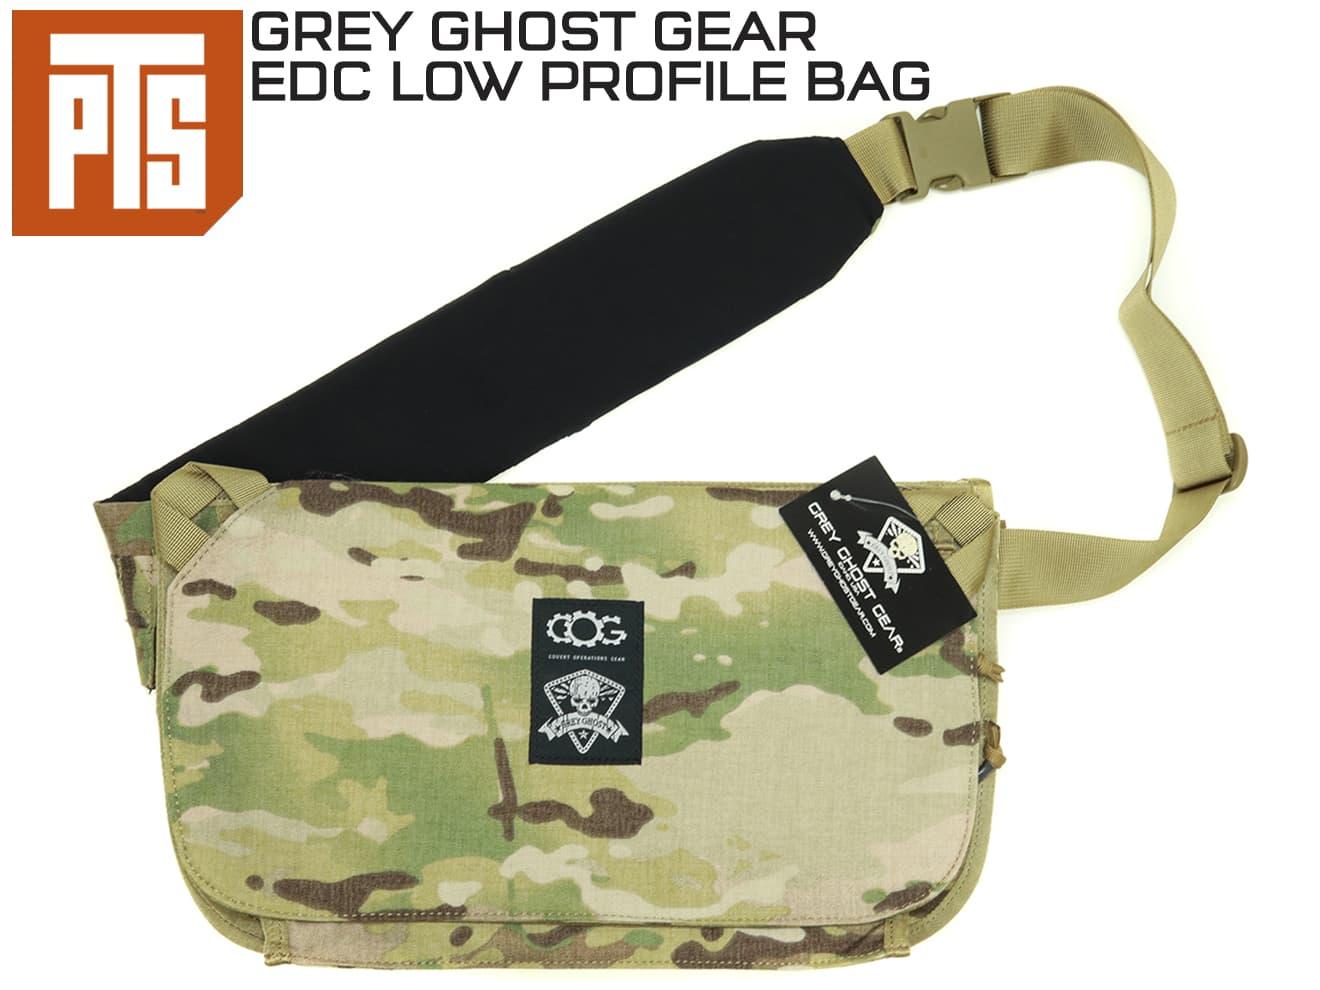 PTS Grey Ghost Gear COG EDCロープロファイルバッグ◆MC グレイゴーストギア マルチユースバッグ ハンドガンケース バッグに サバゲ 射撃